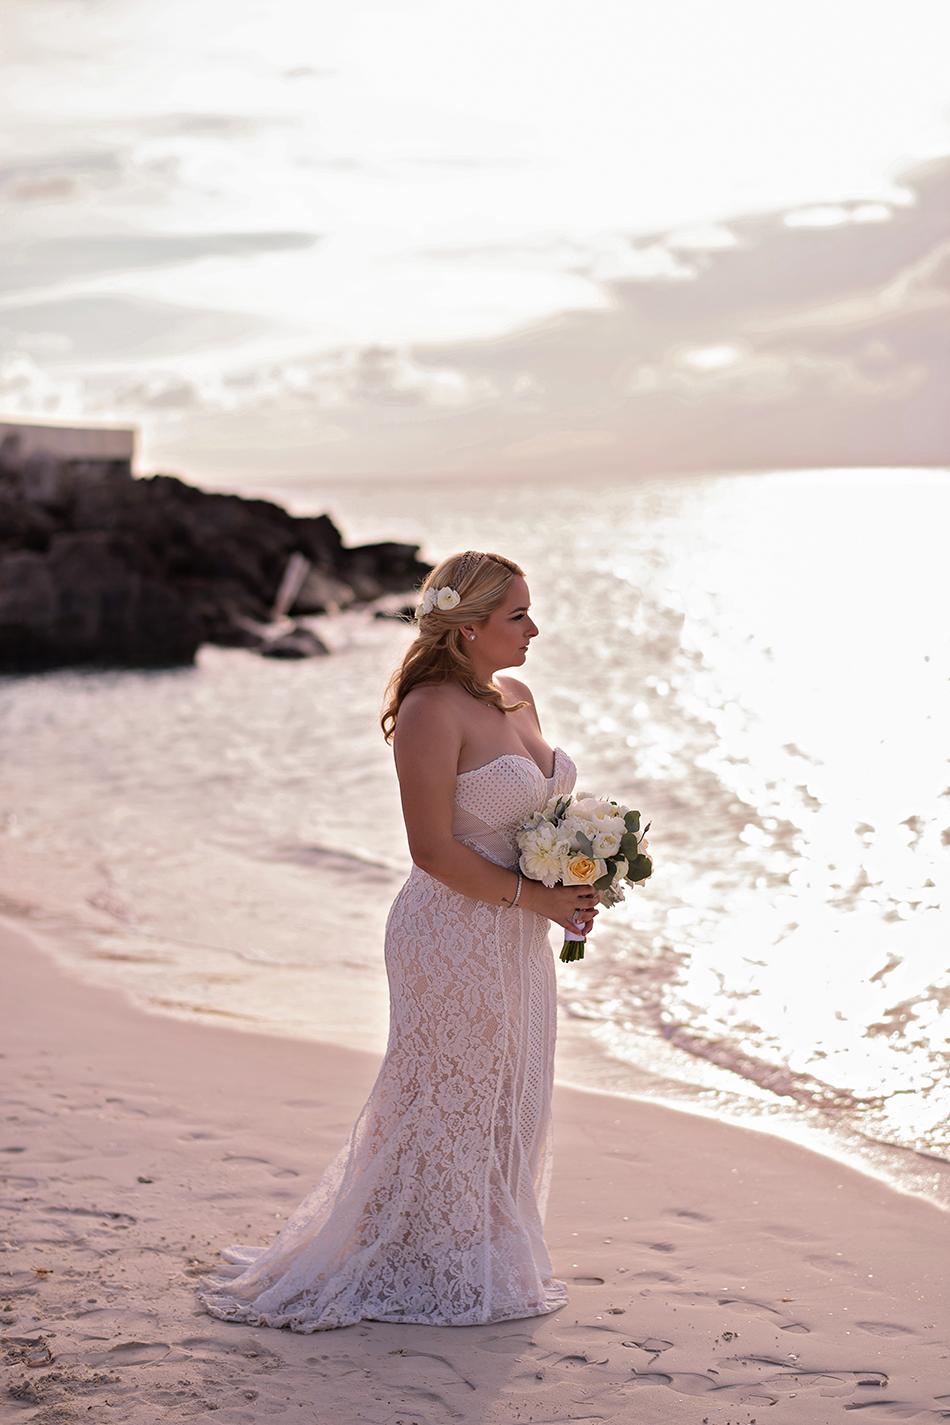 Bimini Bahamas bridal portraits